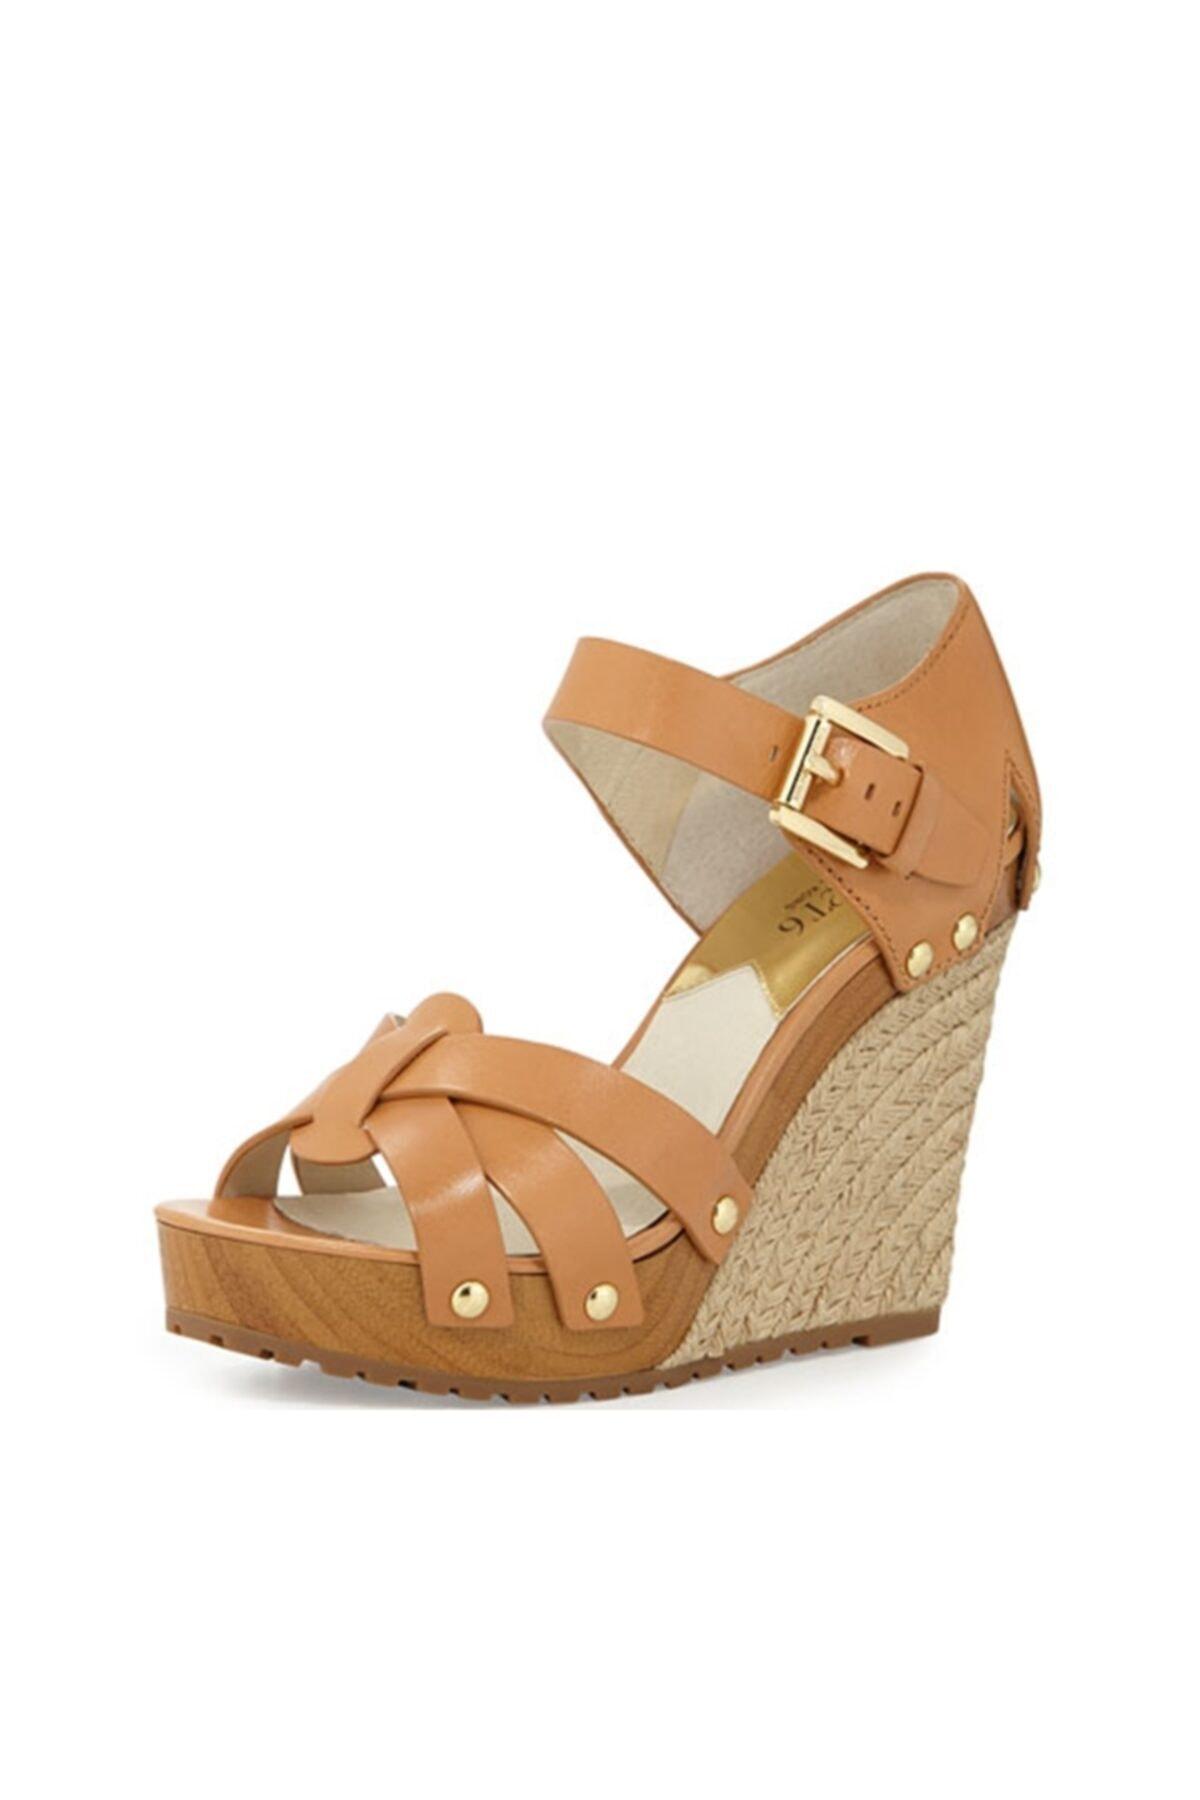 Michael Kors Somerly Bayan Sandalet Yer Fıstığı Rengi 40s5smhs3l 1